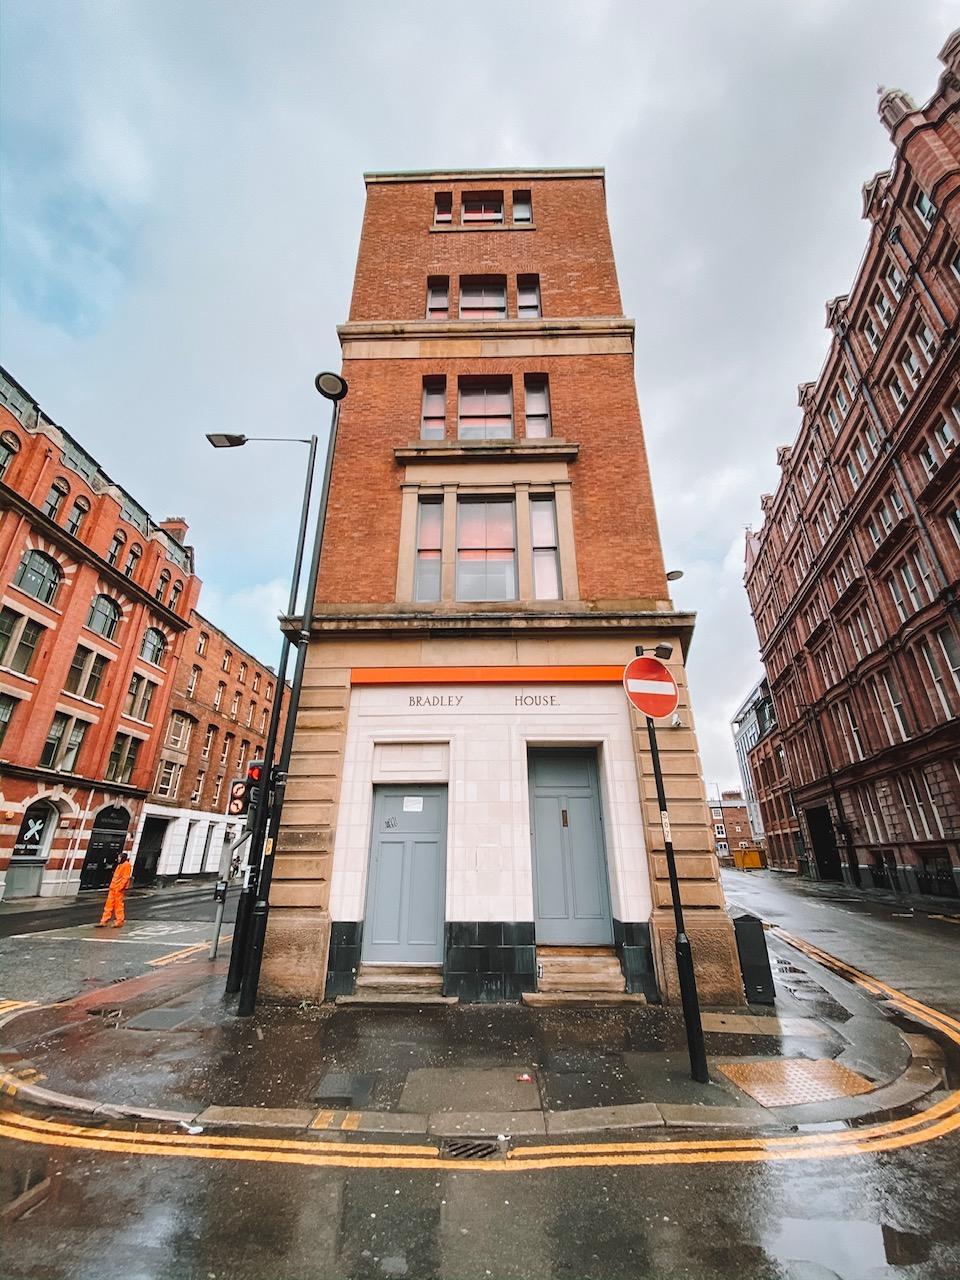 Travel blogger Amanda Martin shares her guide to Manchester, England